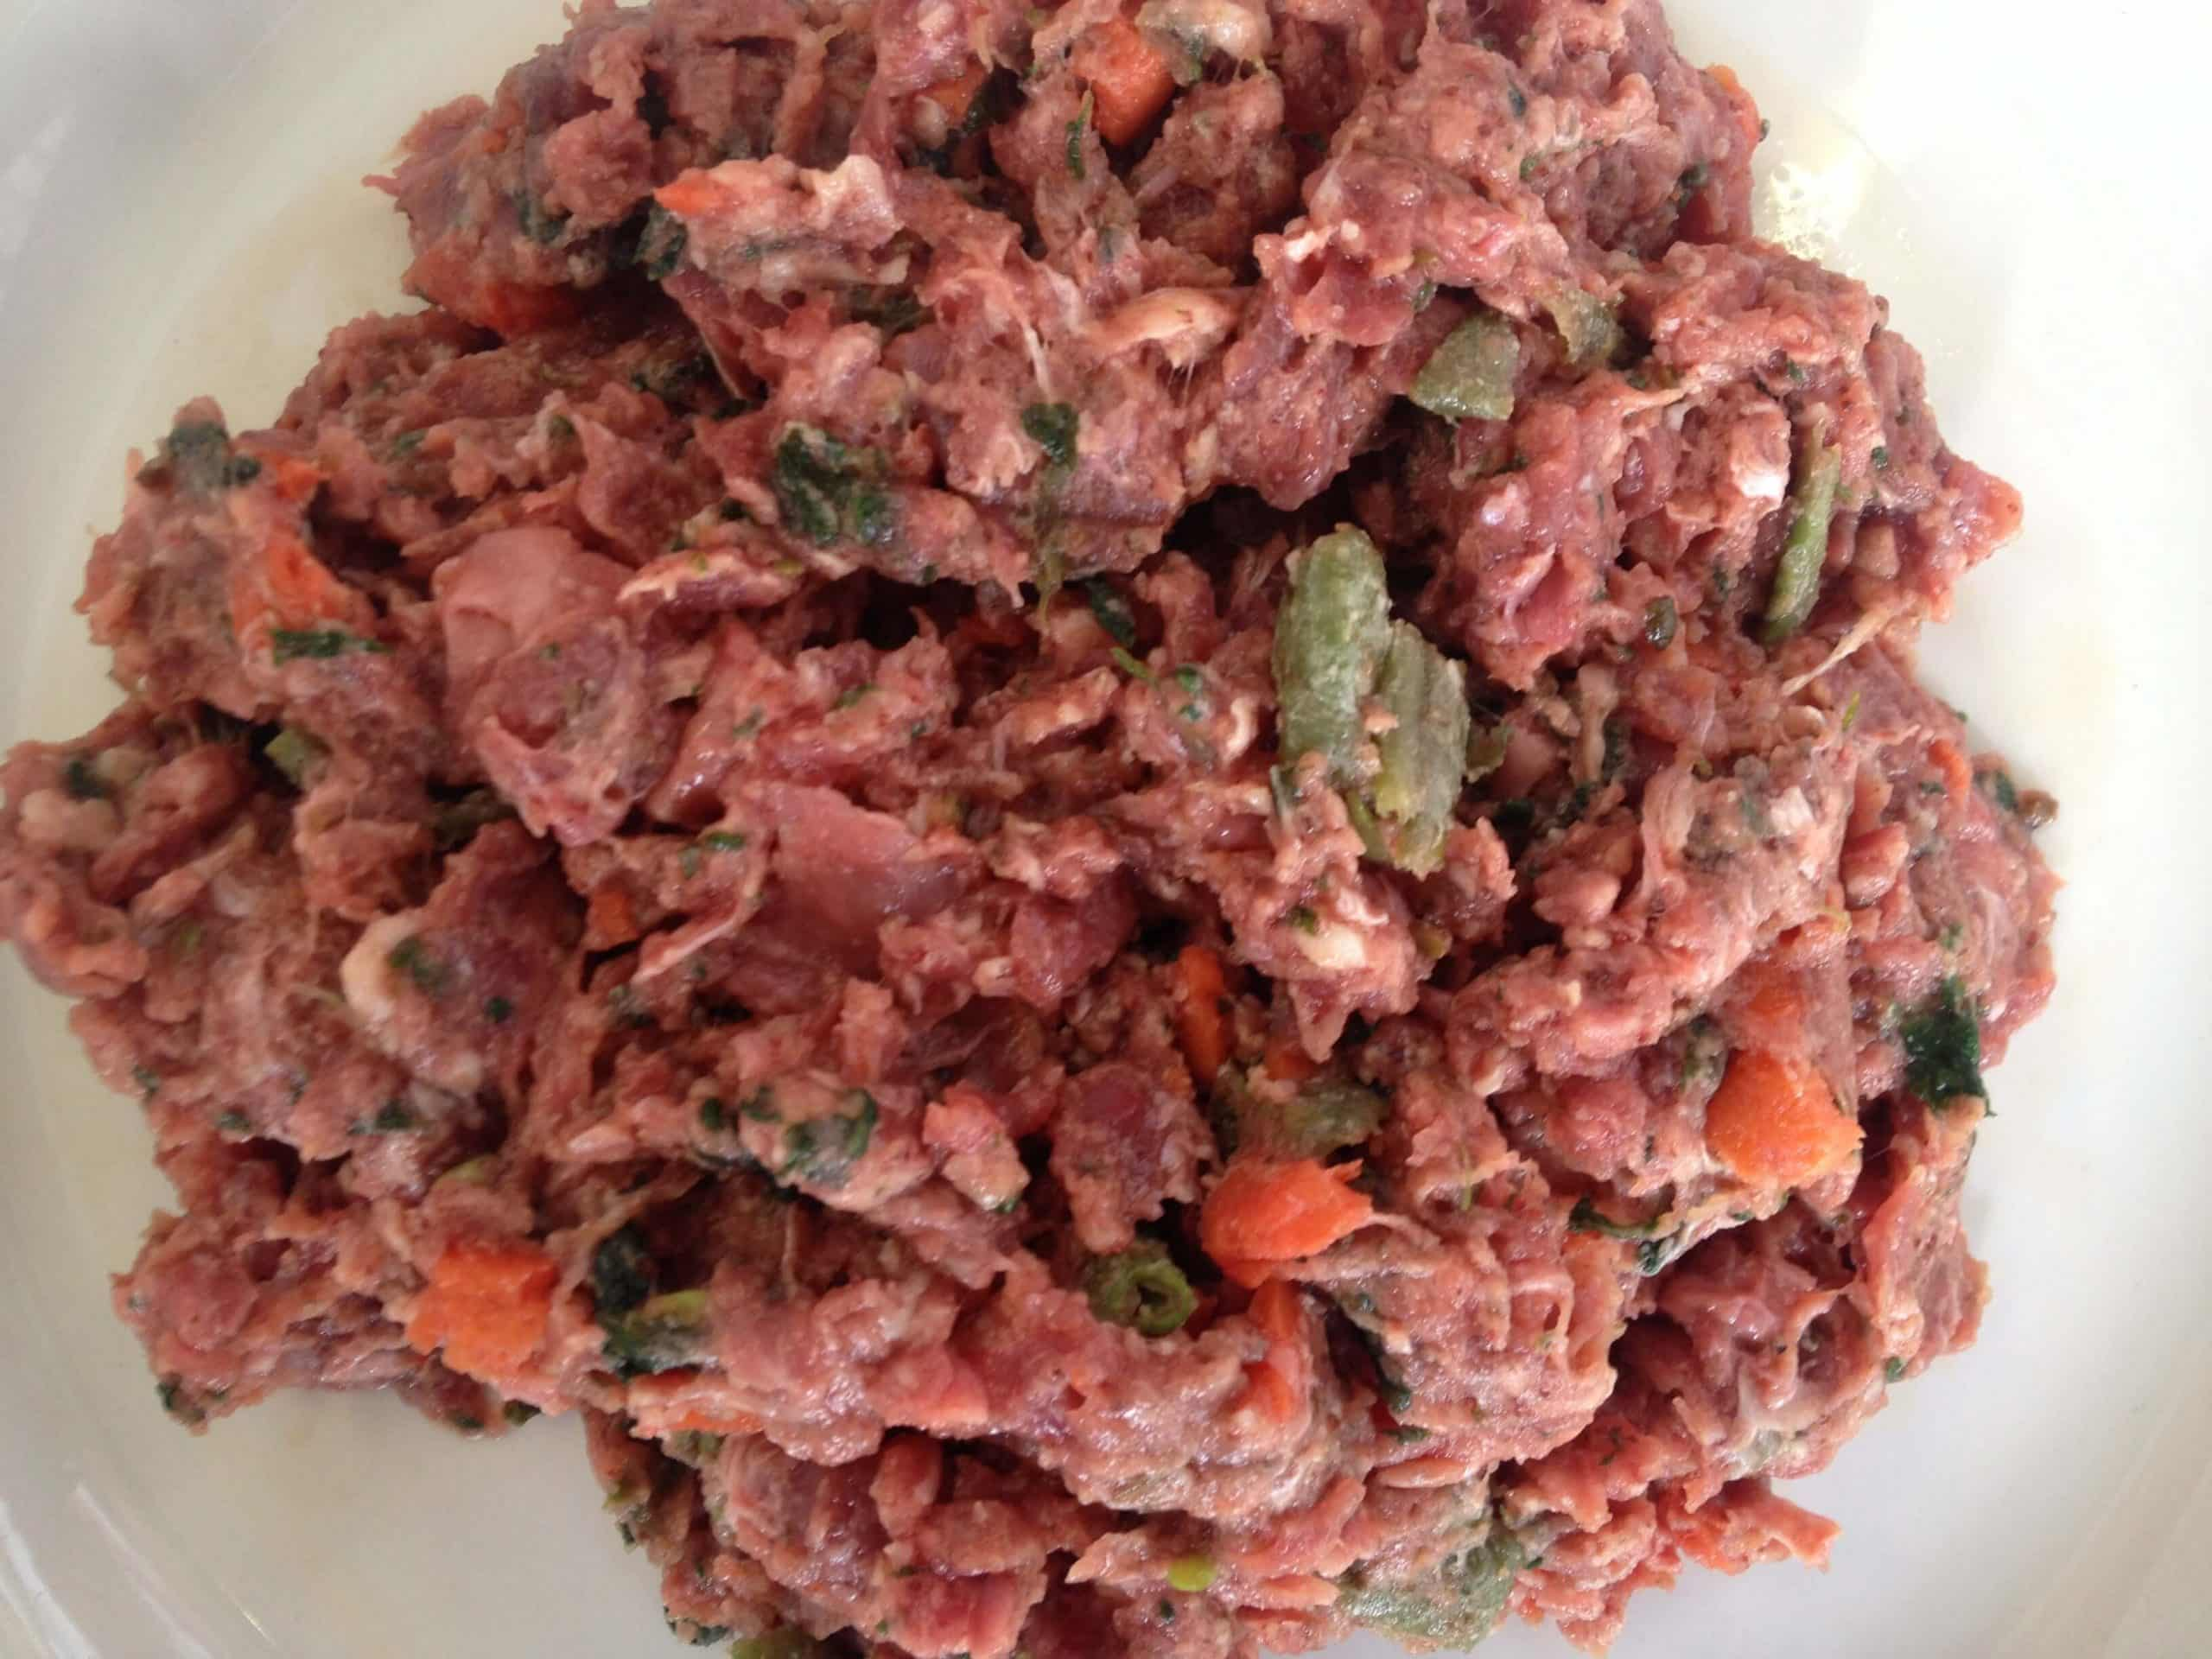 DIY raw diet recipes